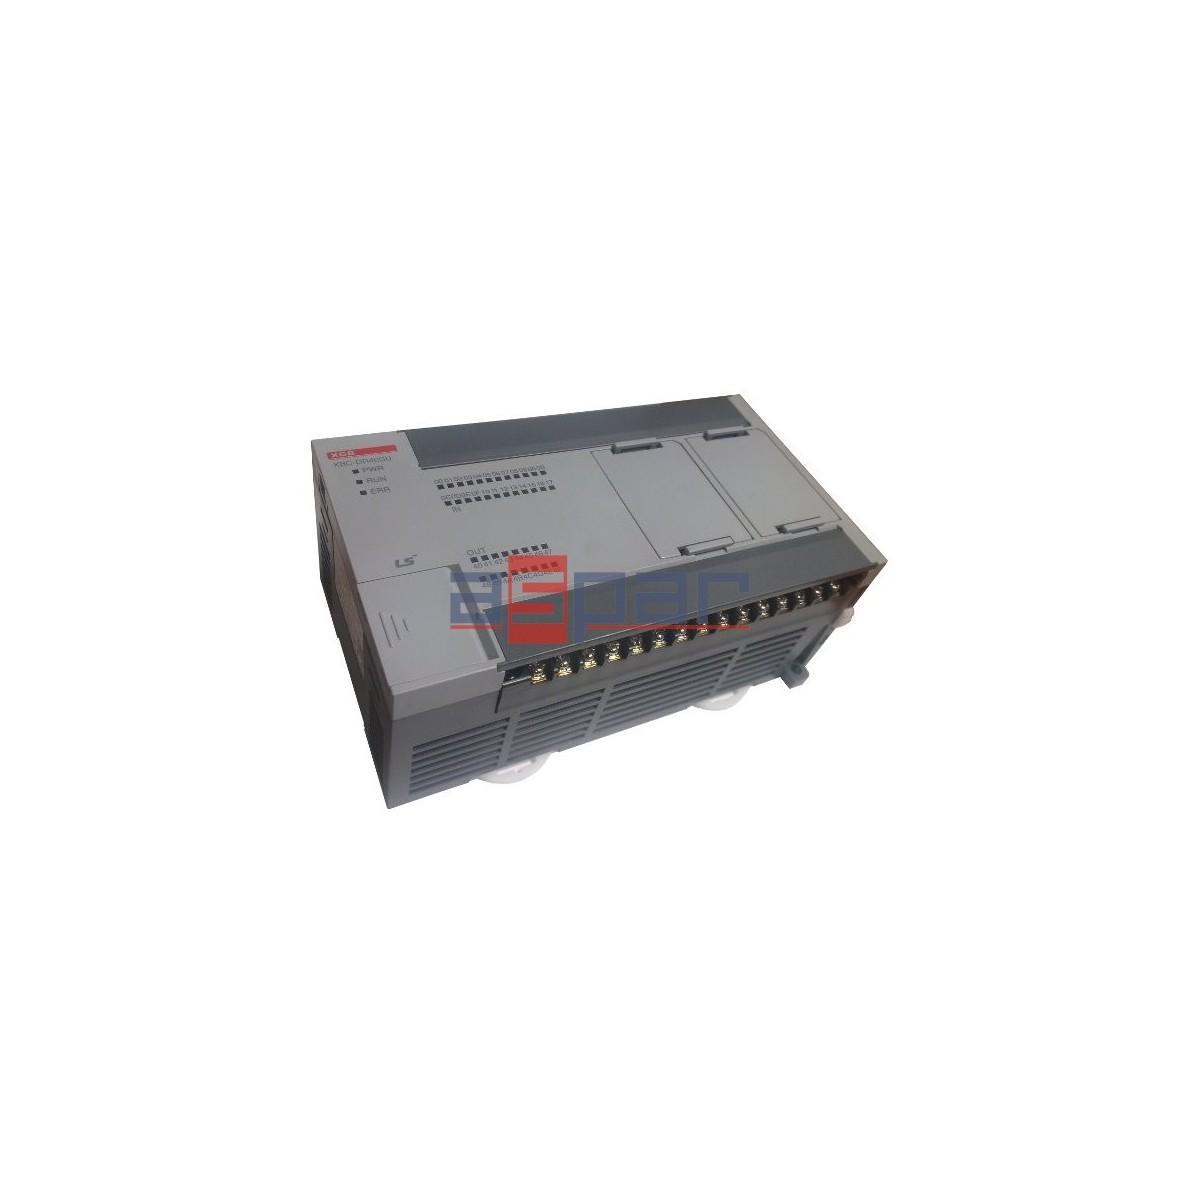 XBC-DR40SU - CPU 24 I/16 O przekaźnik